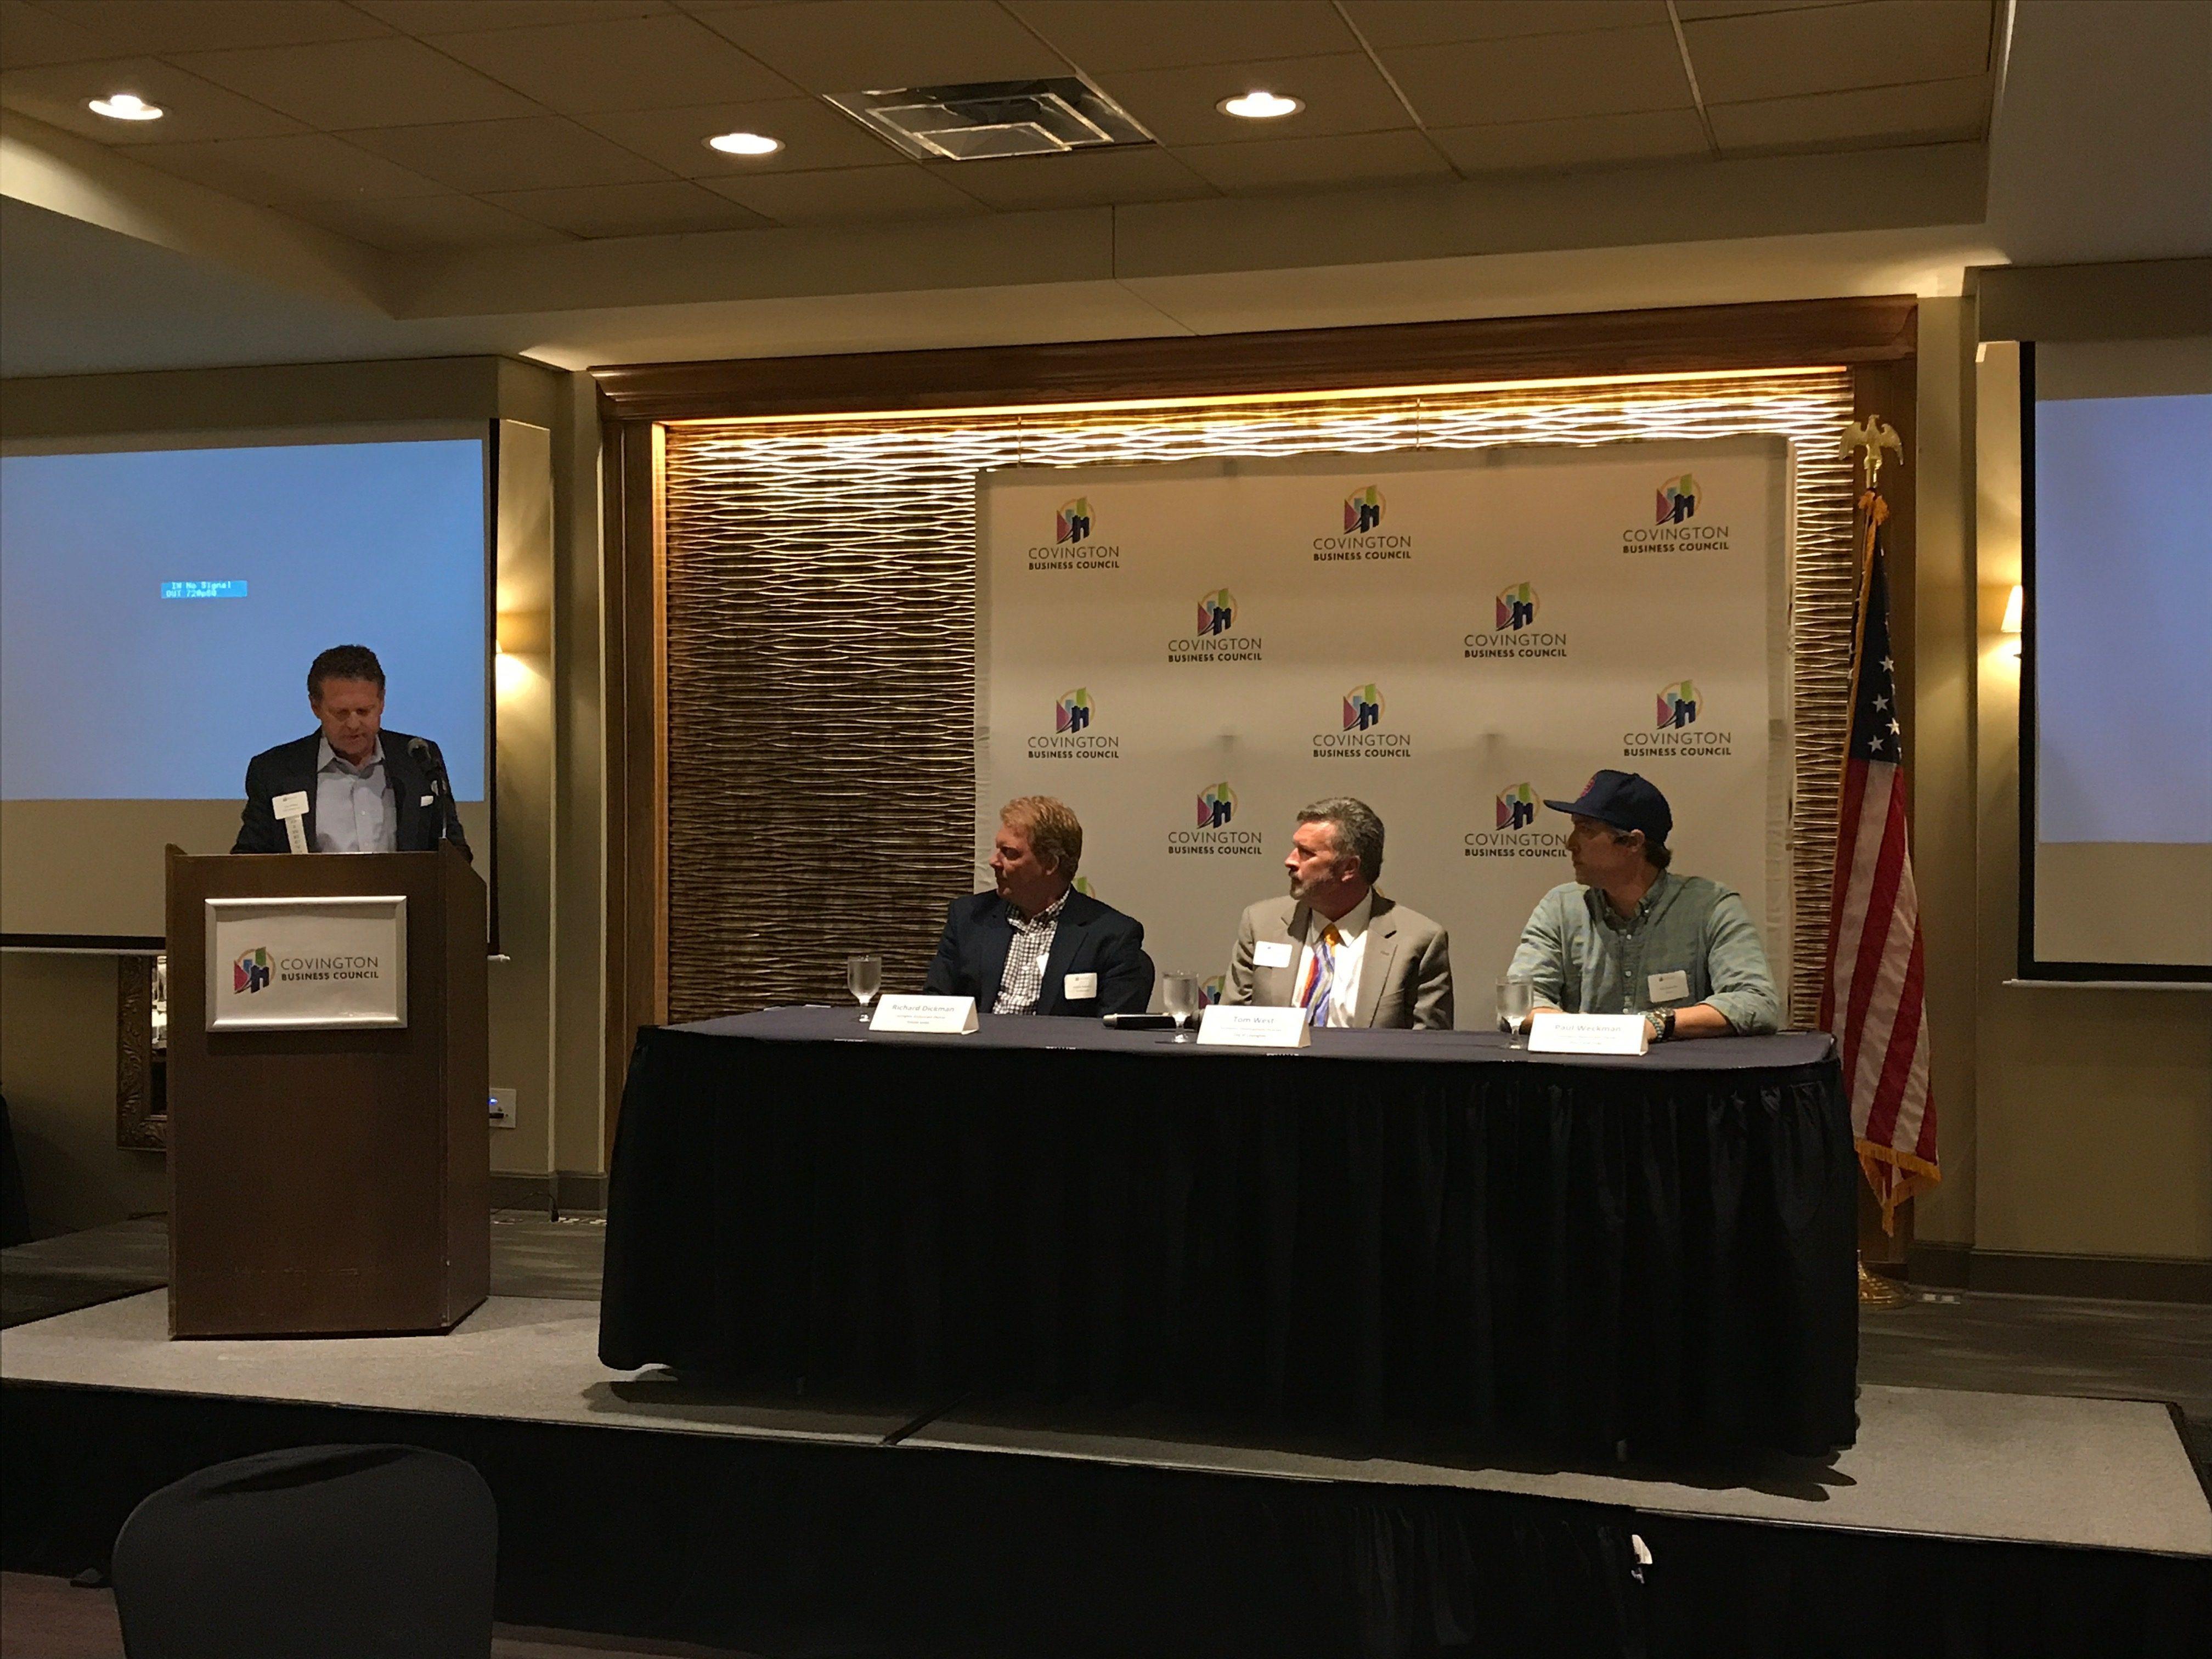 Covington Business Council Panelists Talk About Role And Importance